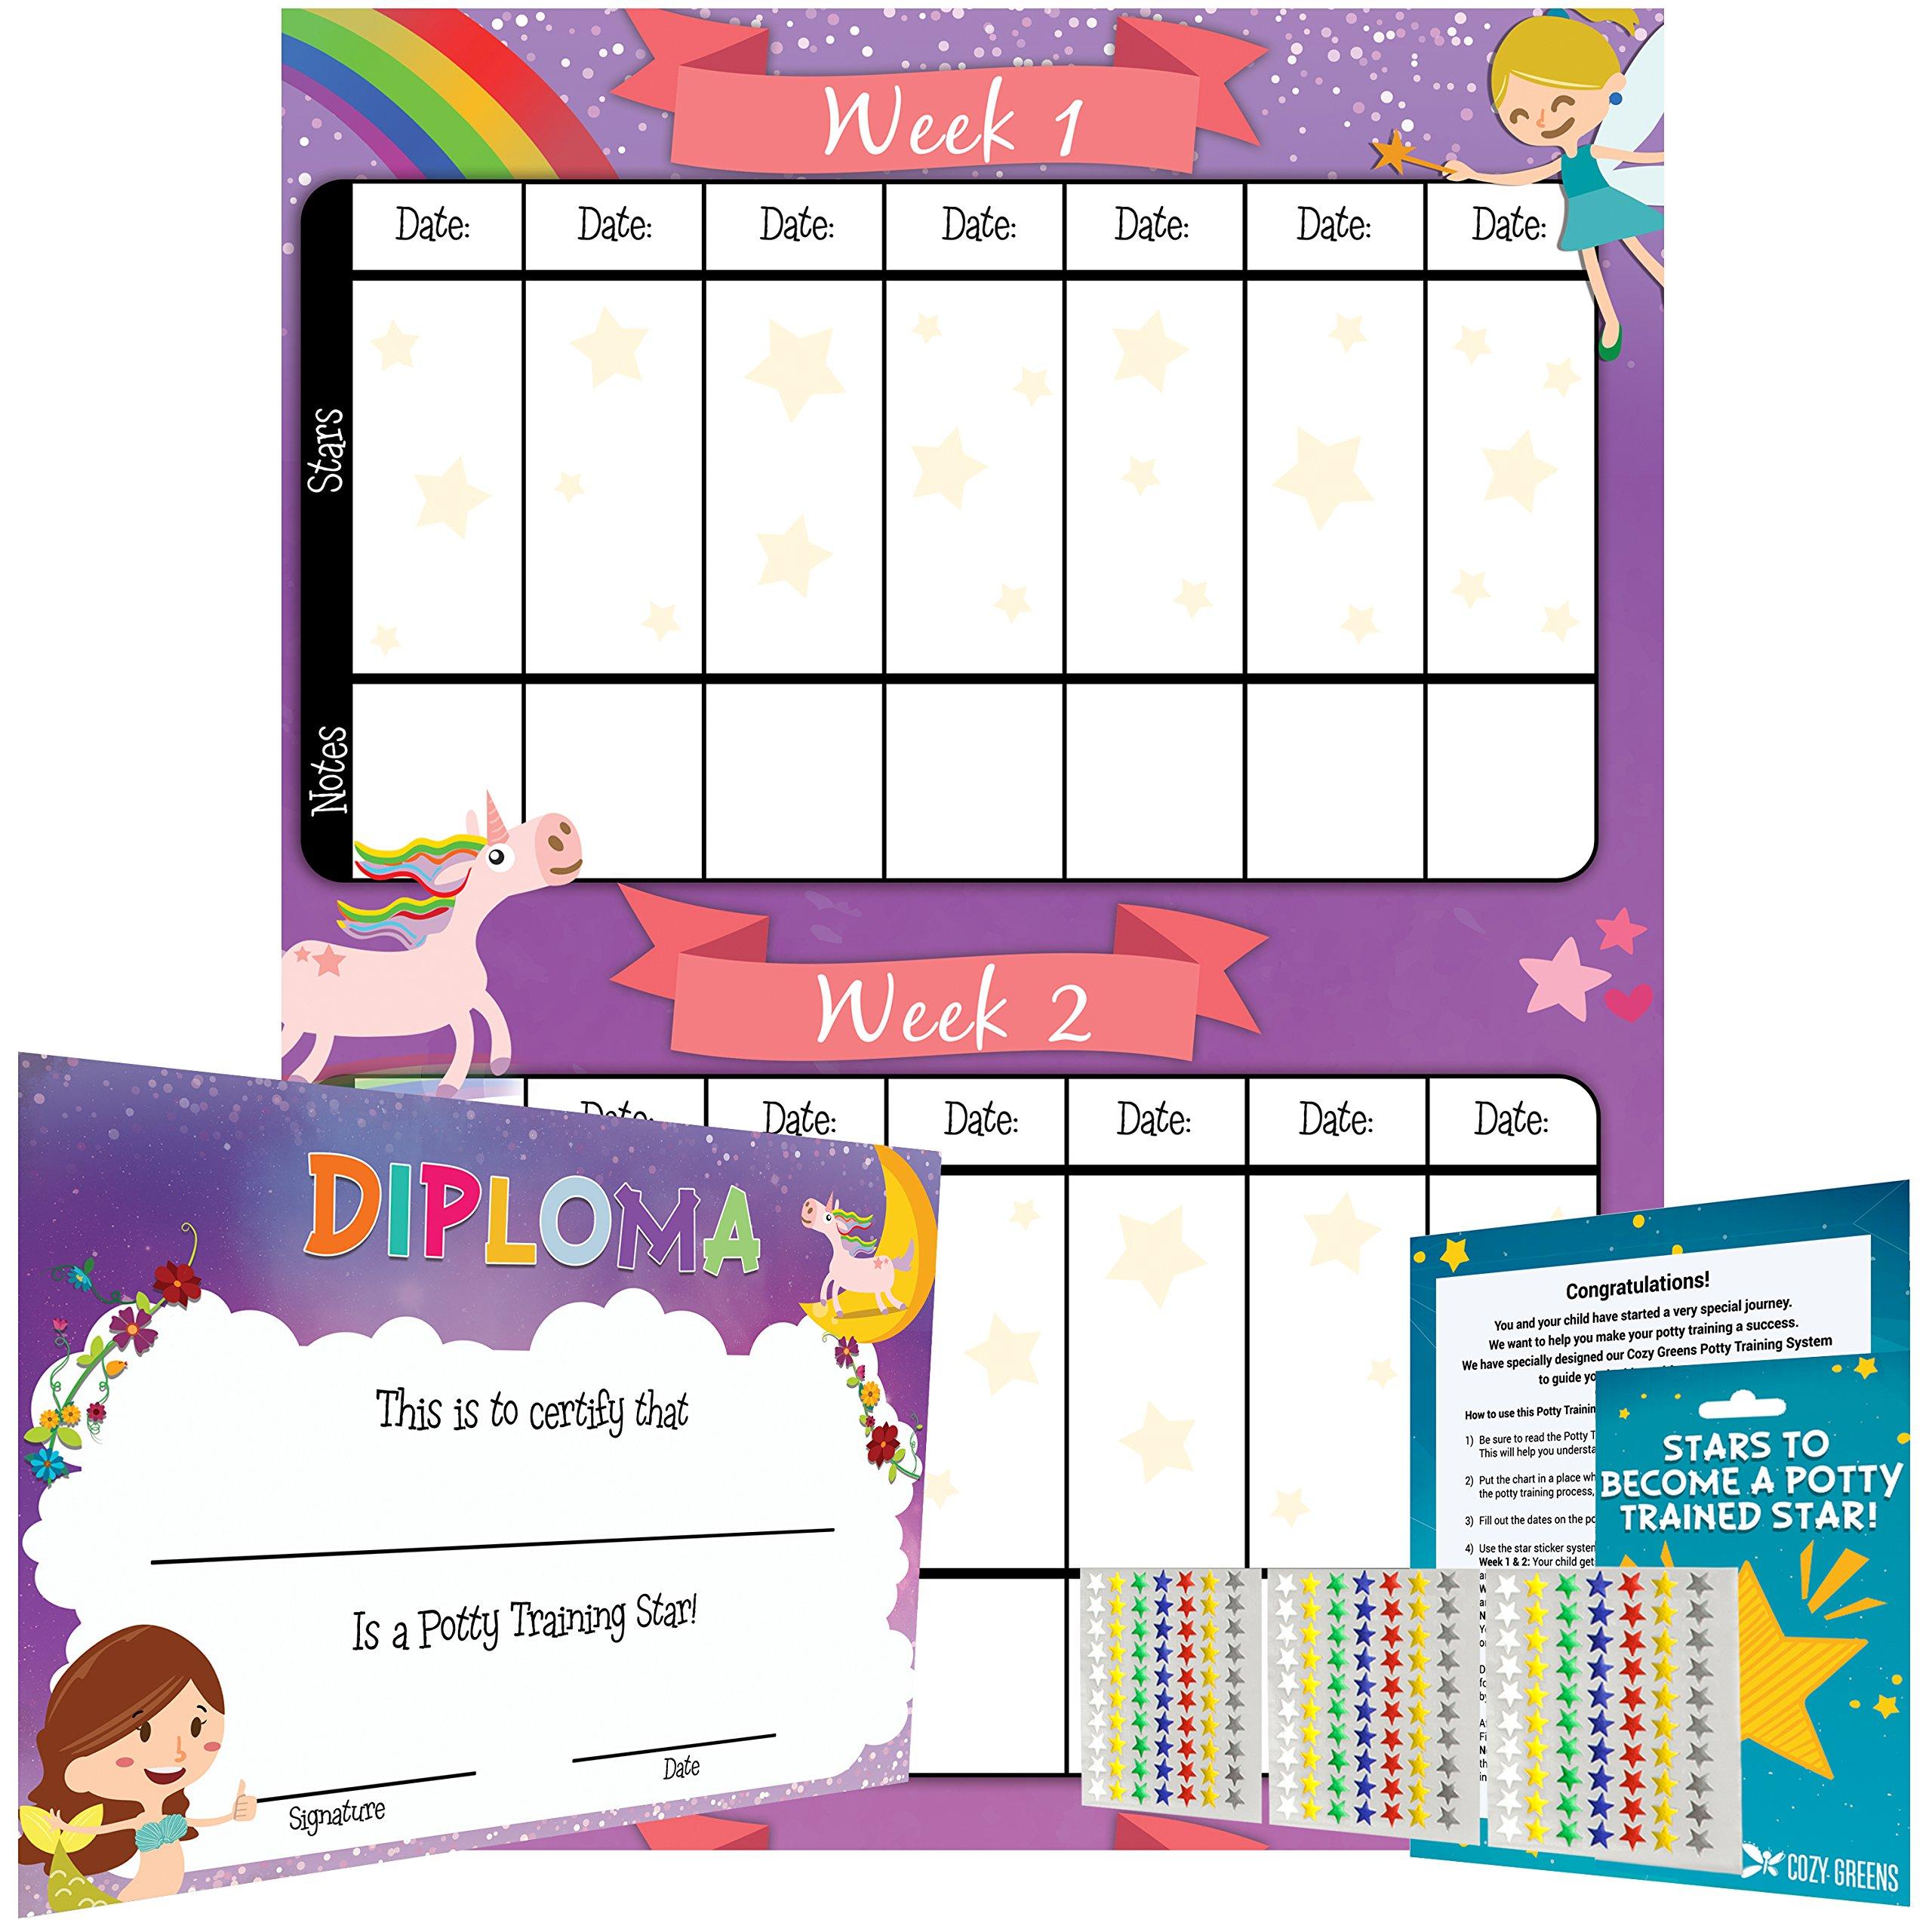 Potty Training Chart - Reward Sticker Chart - Girls Theme - Marks Behavior Progress – Motivational Toilet Training for Toddlers and Children – Great for Boys and for Girls